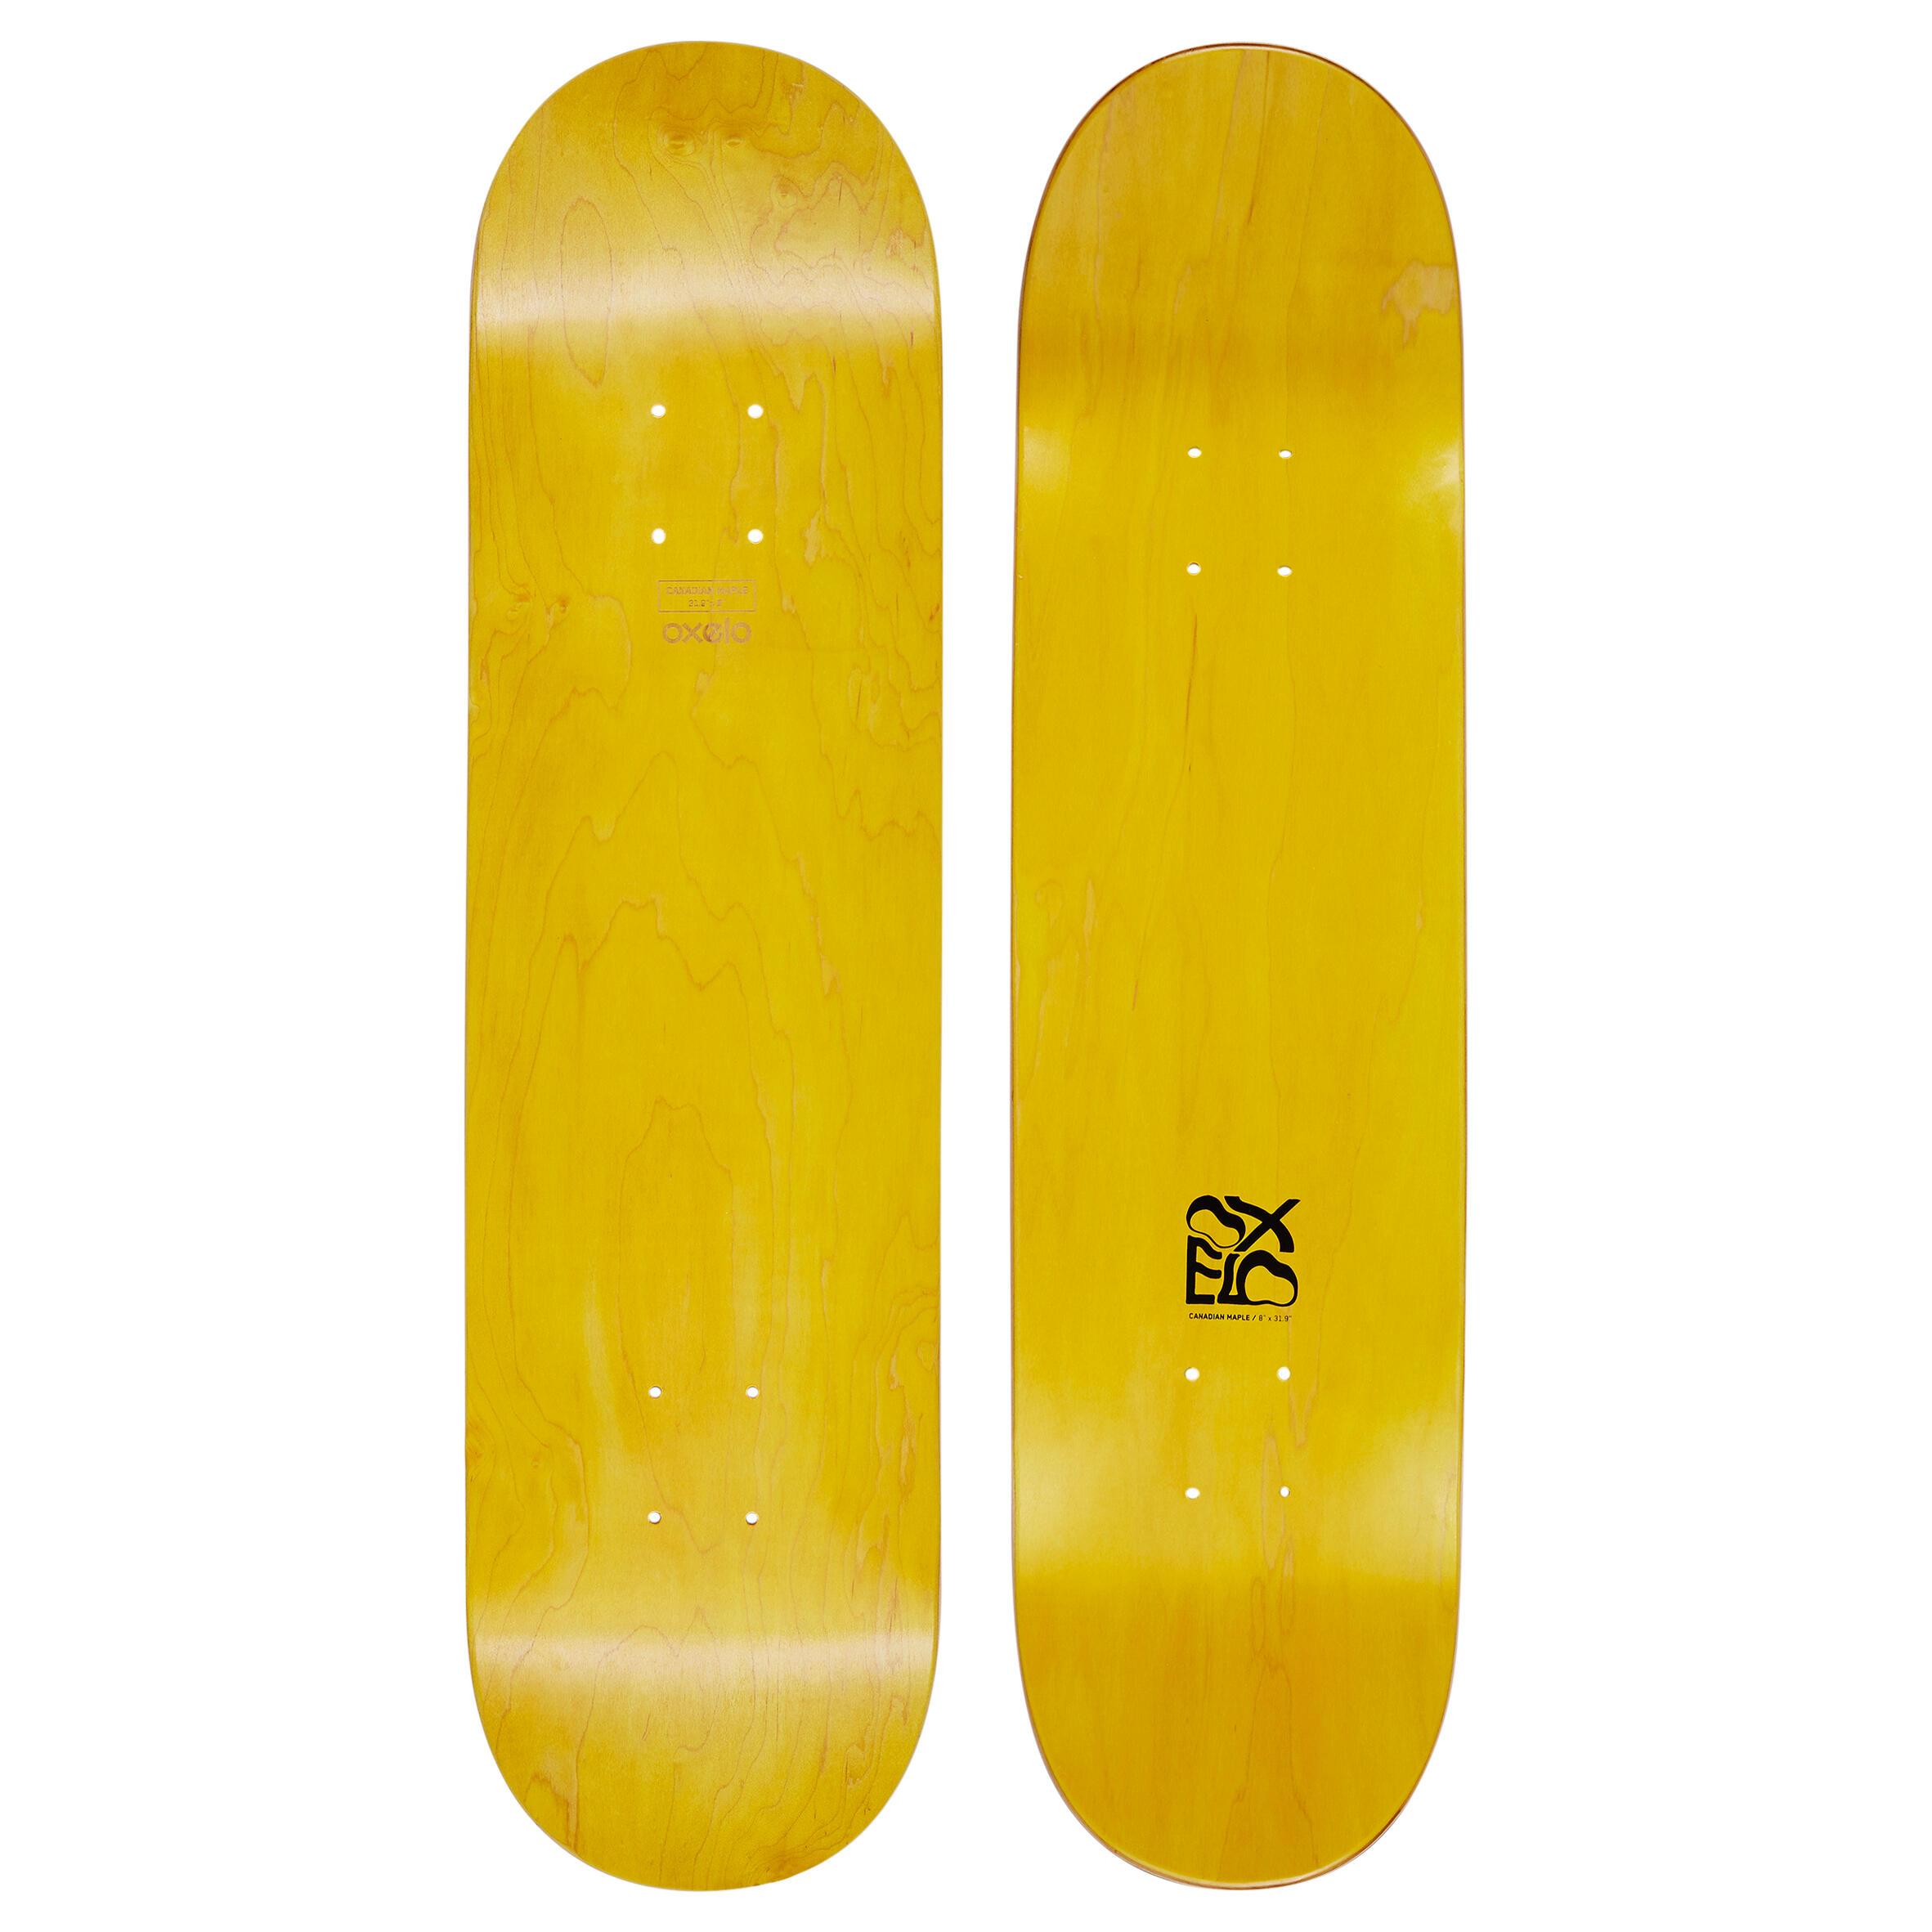 "Team Nude 8"" Skateboard Deck - Yellow"